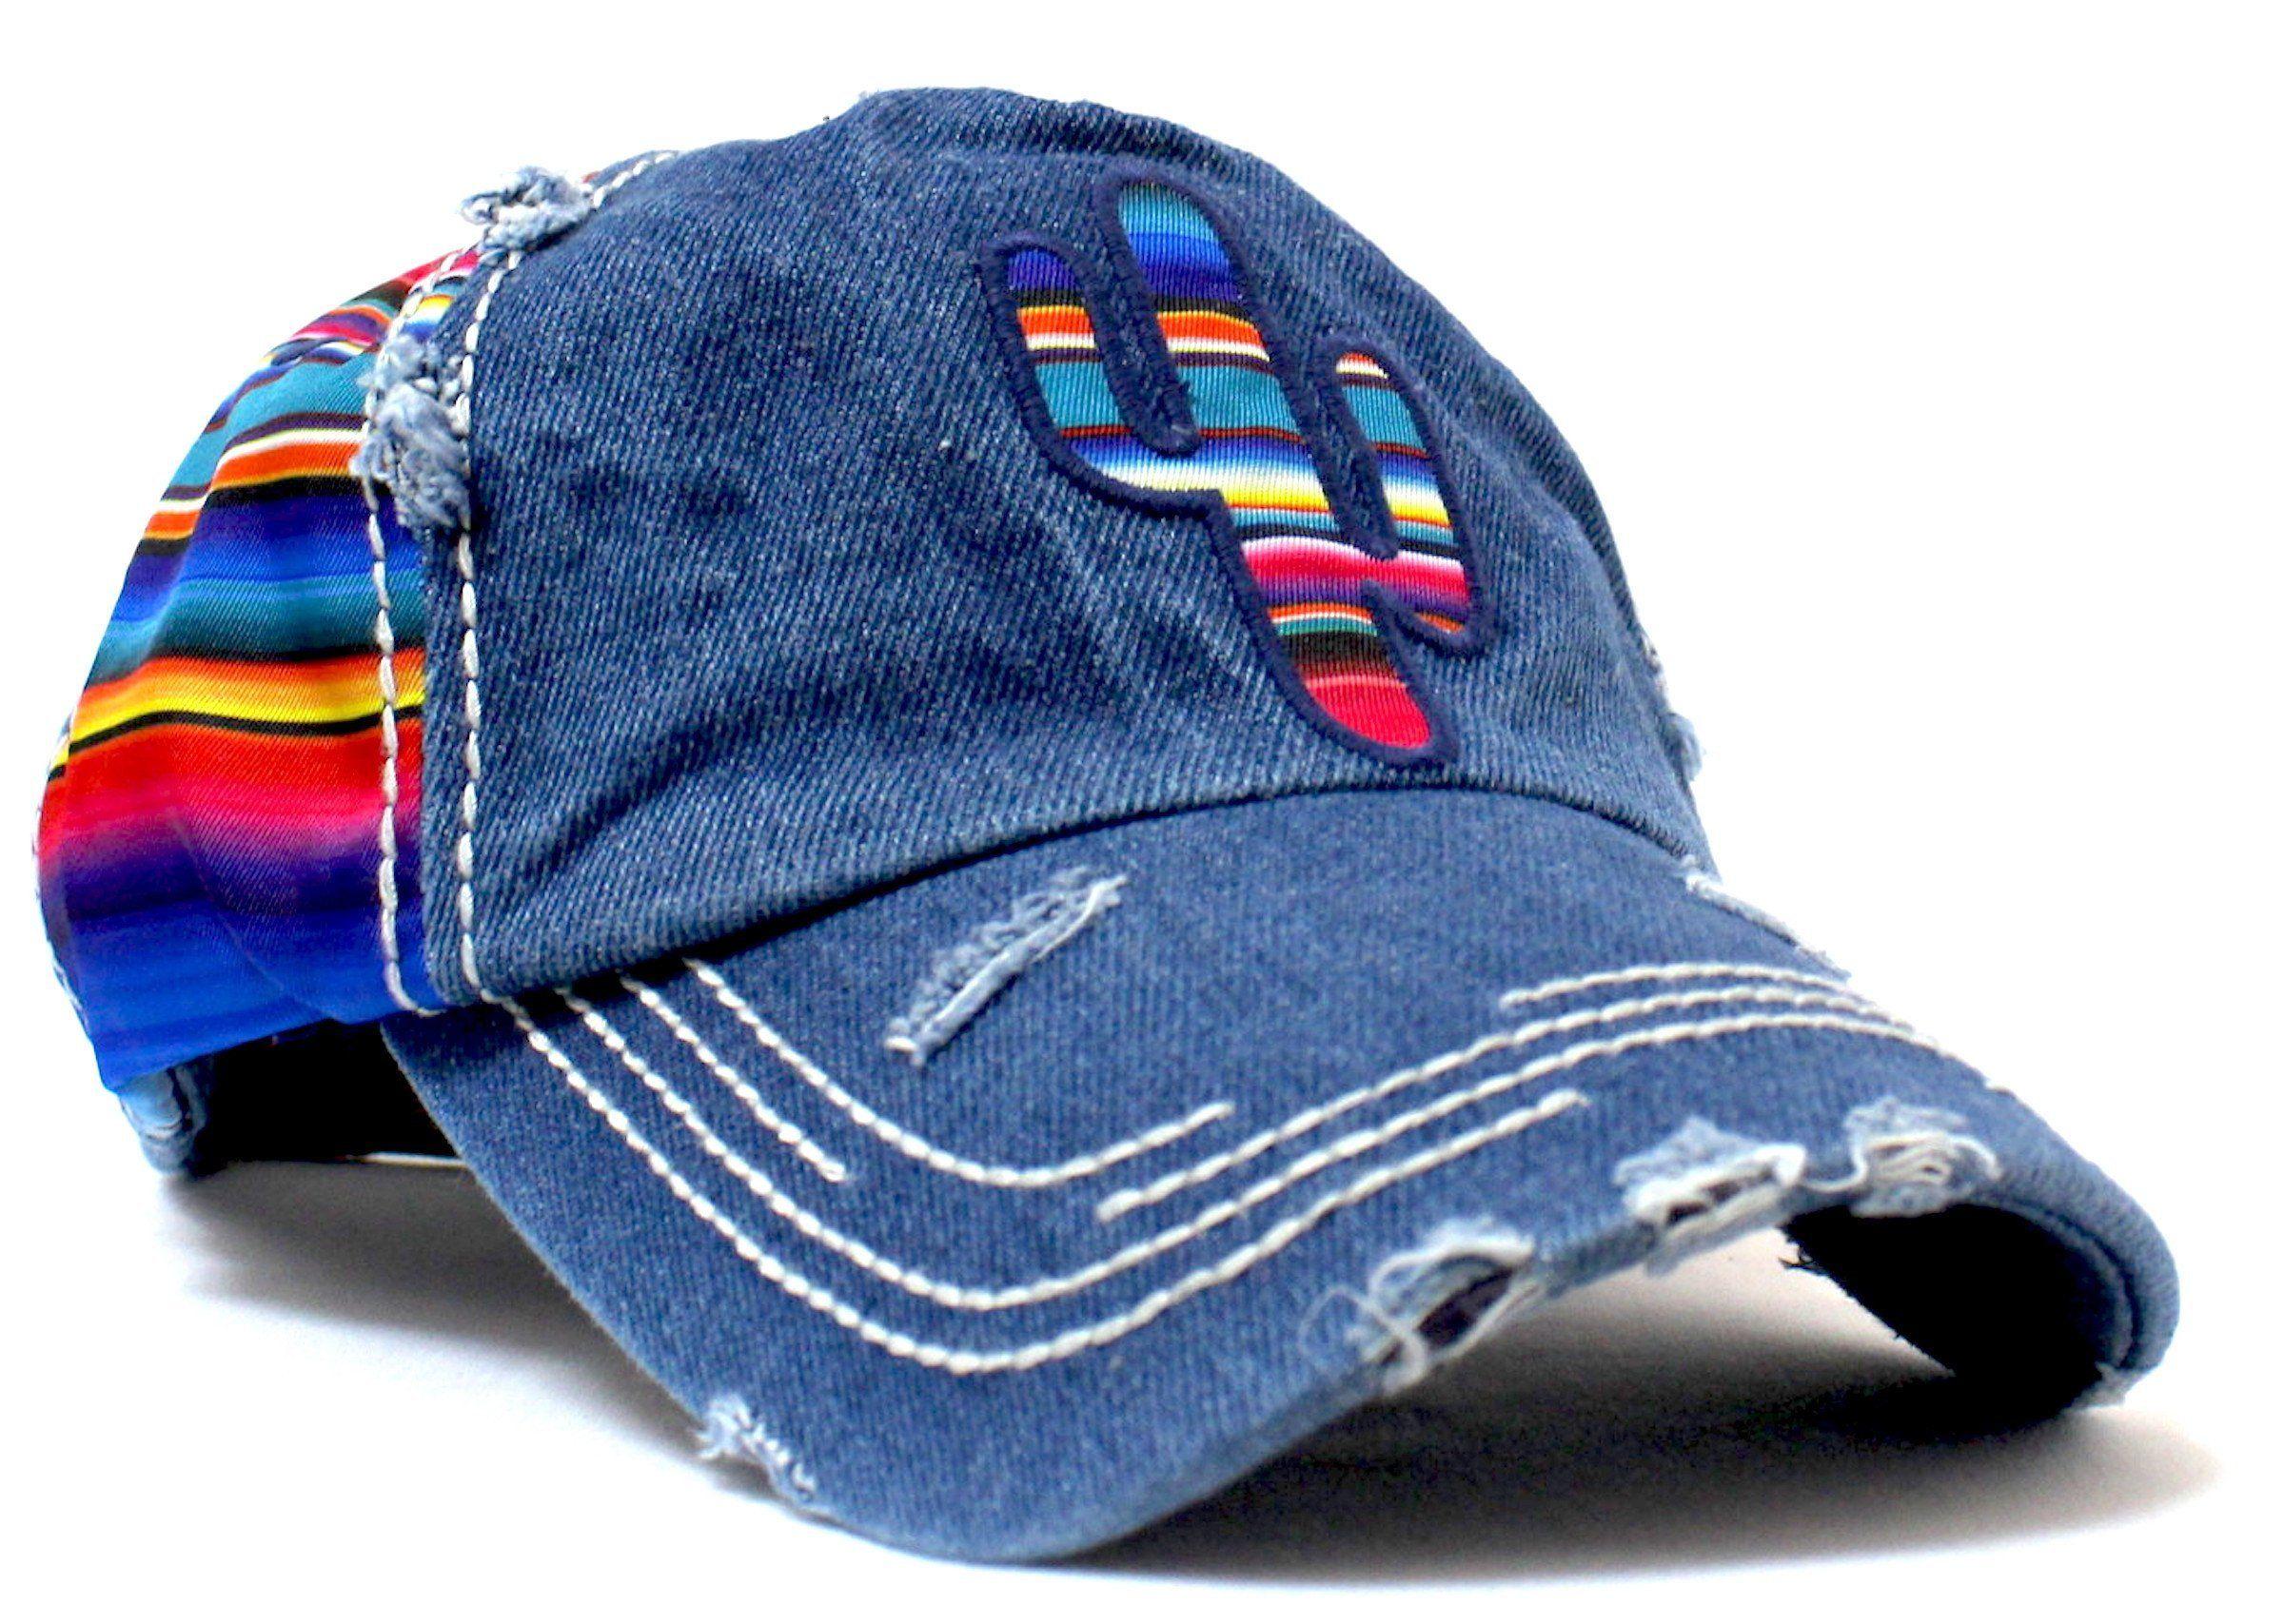 5a2ed316e8 Serape-Colored CACTUS Embroidery on Vintage Style, Distressed Cap ...